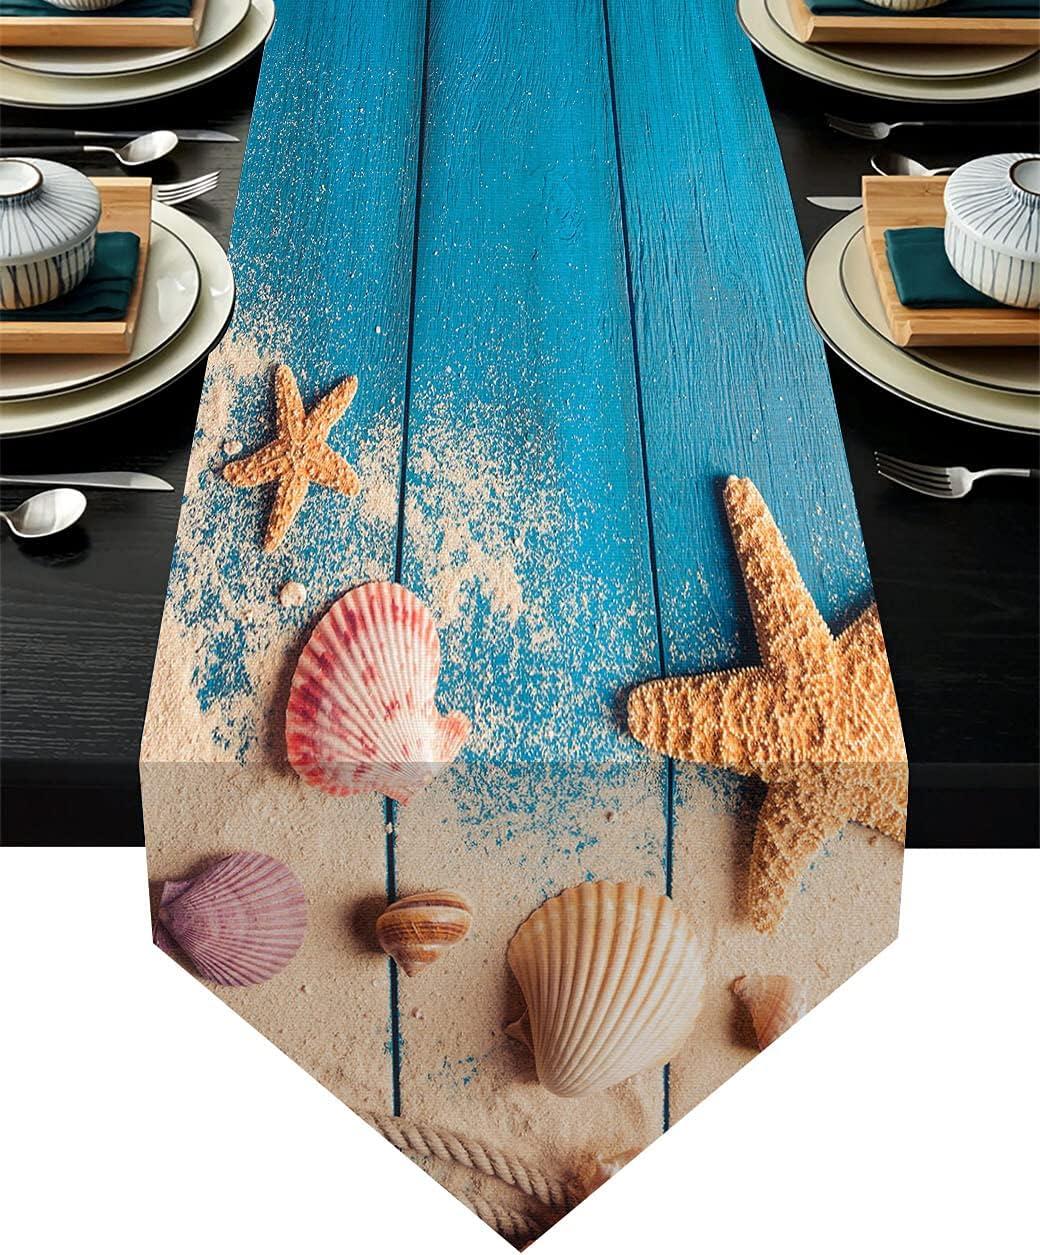 Kawani Starfish Beach Table Runner Non-Slip Coastal Kitchen Blue Wood Striped Decor Seashell Table Runners 13x70 Inch for Farmhouse Dining Home Outdoor Party Wedding Decor